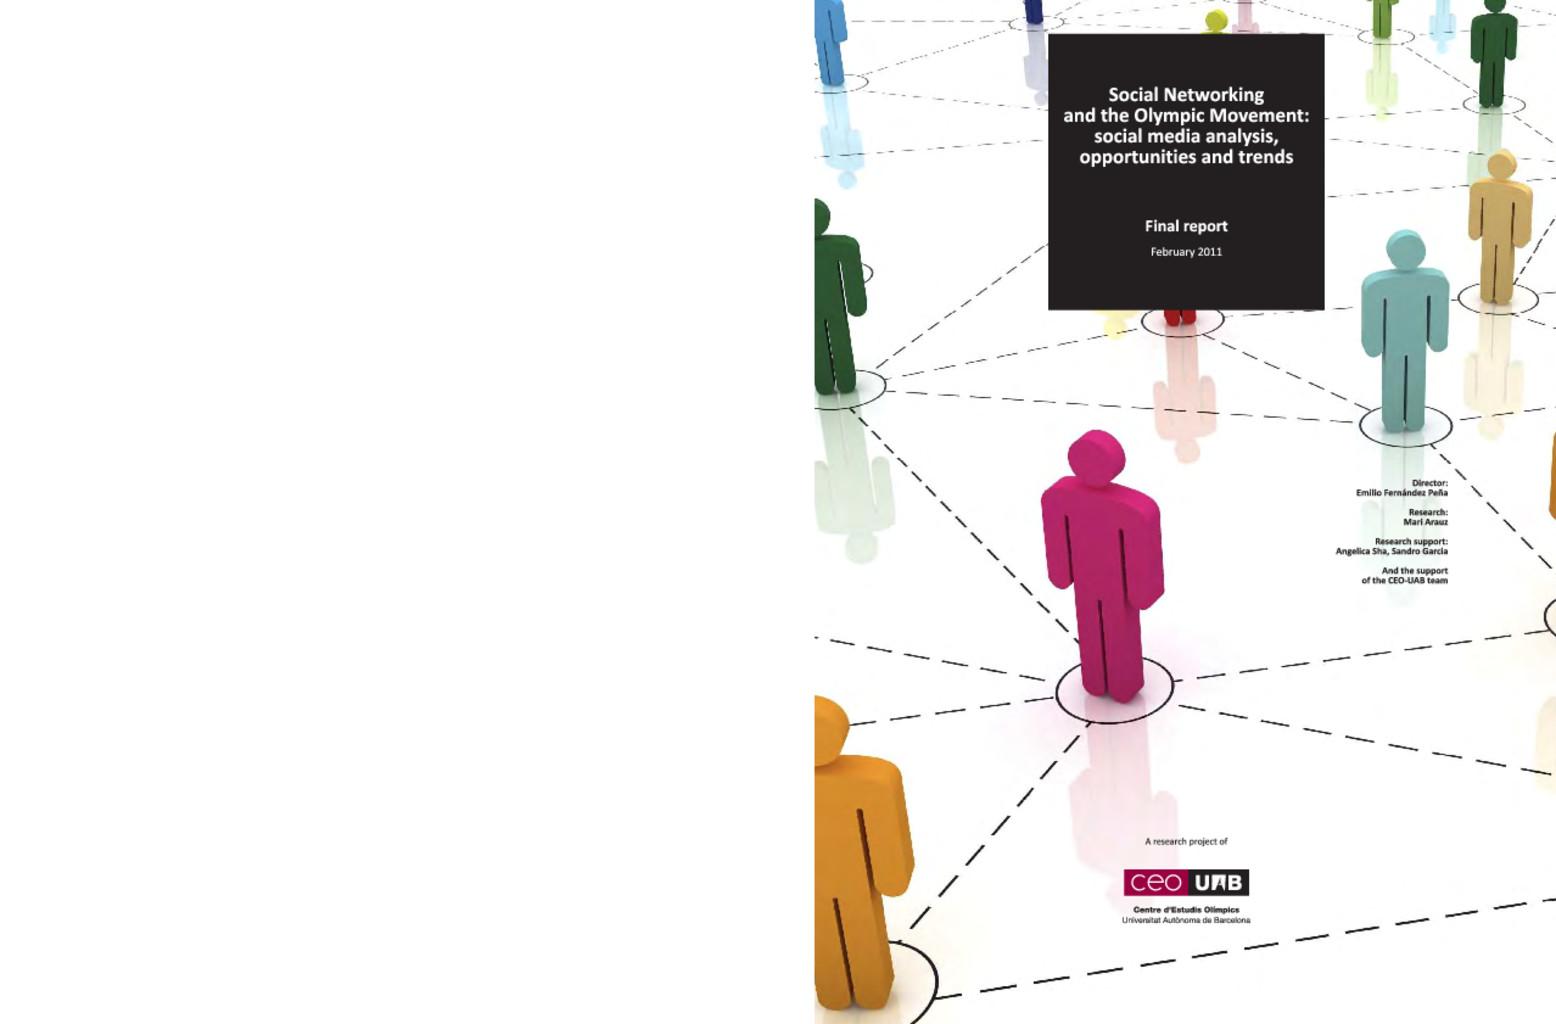 Social networking and the Olympic Movement : social media analysis, opportunities and trends : final report = Centre d'Estudis Olímpics, Universitat Autónoma de Barcelona / dir. Emilio Fernández Peña | Fernández Peña, Emilio